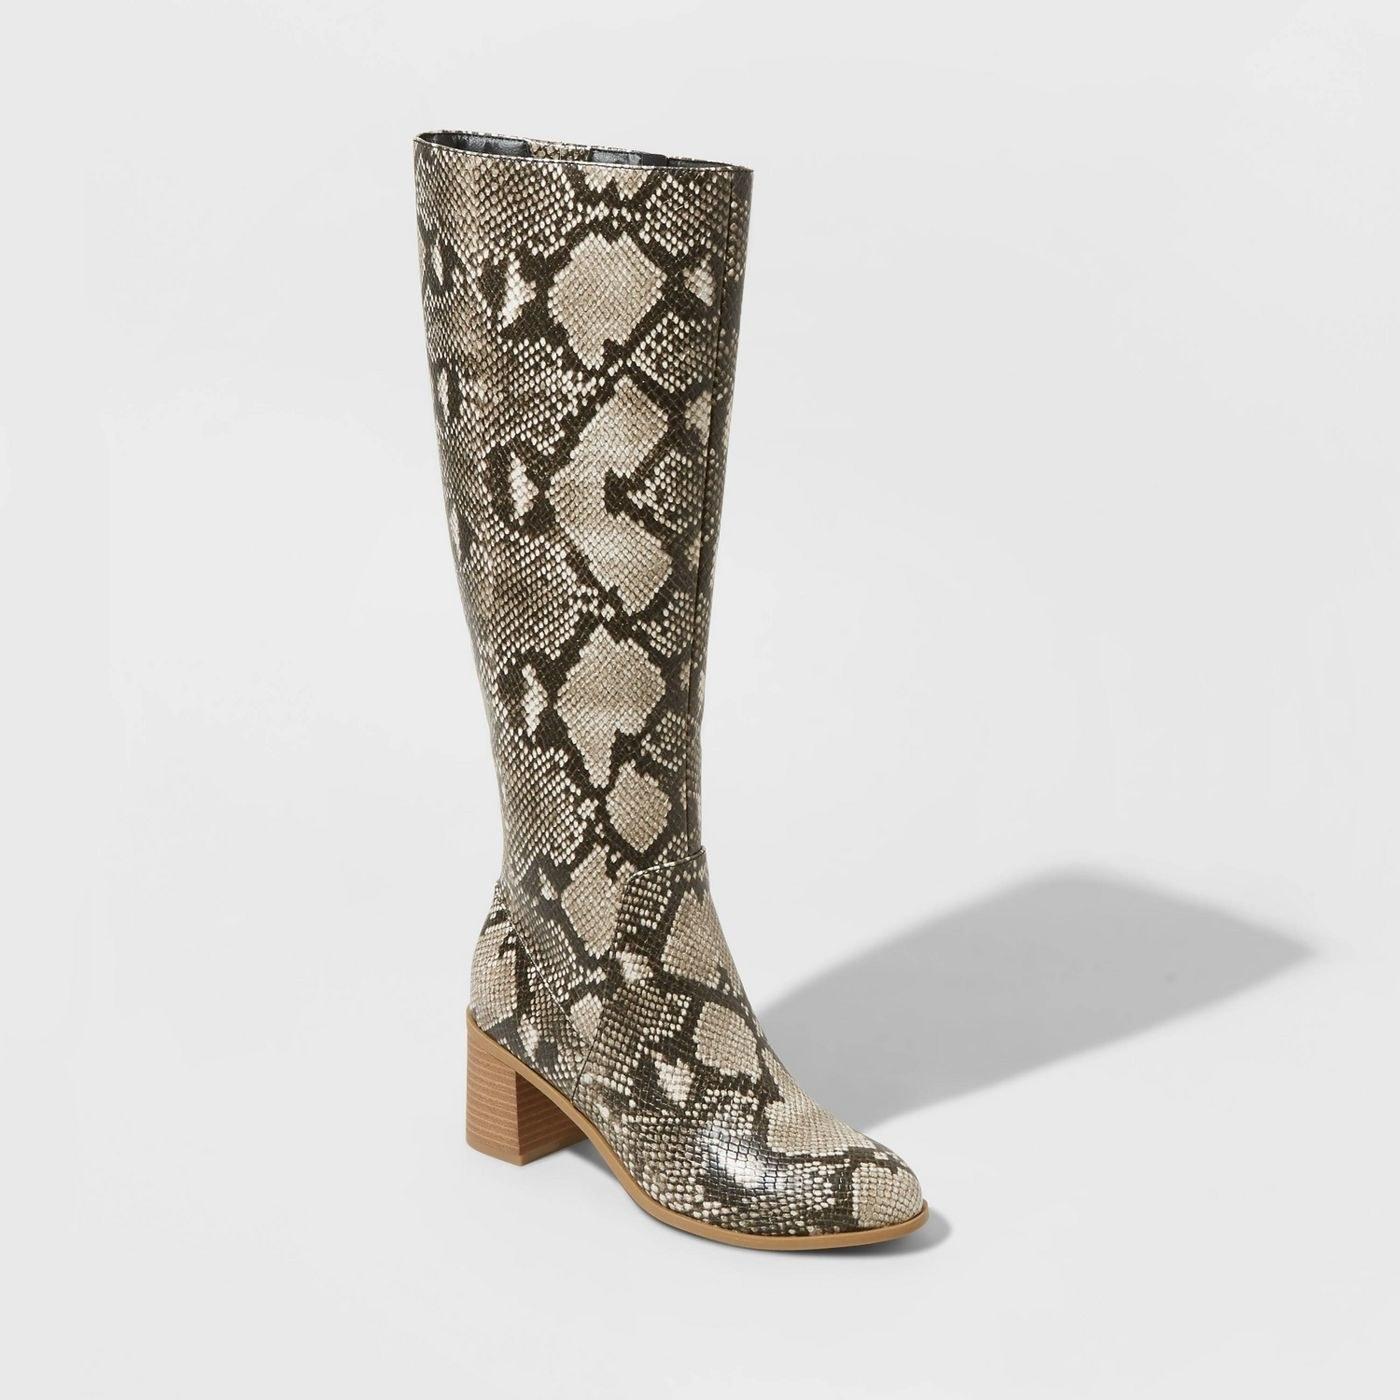 snakeskin knee high boots